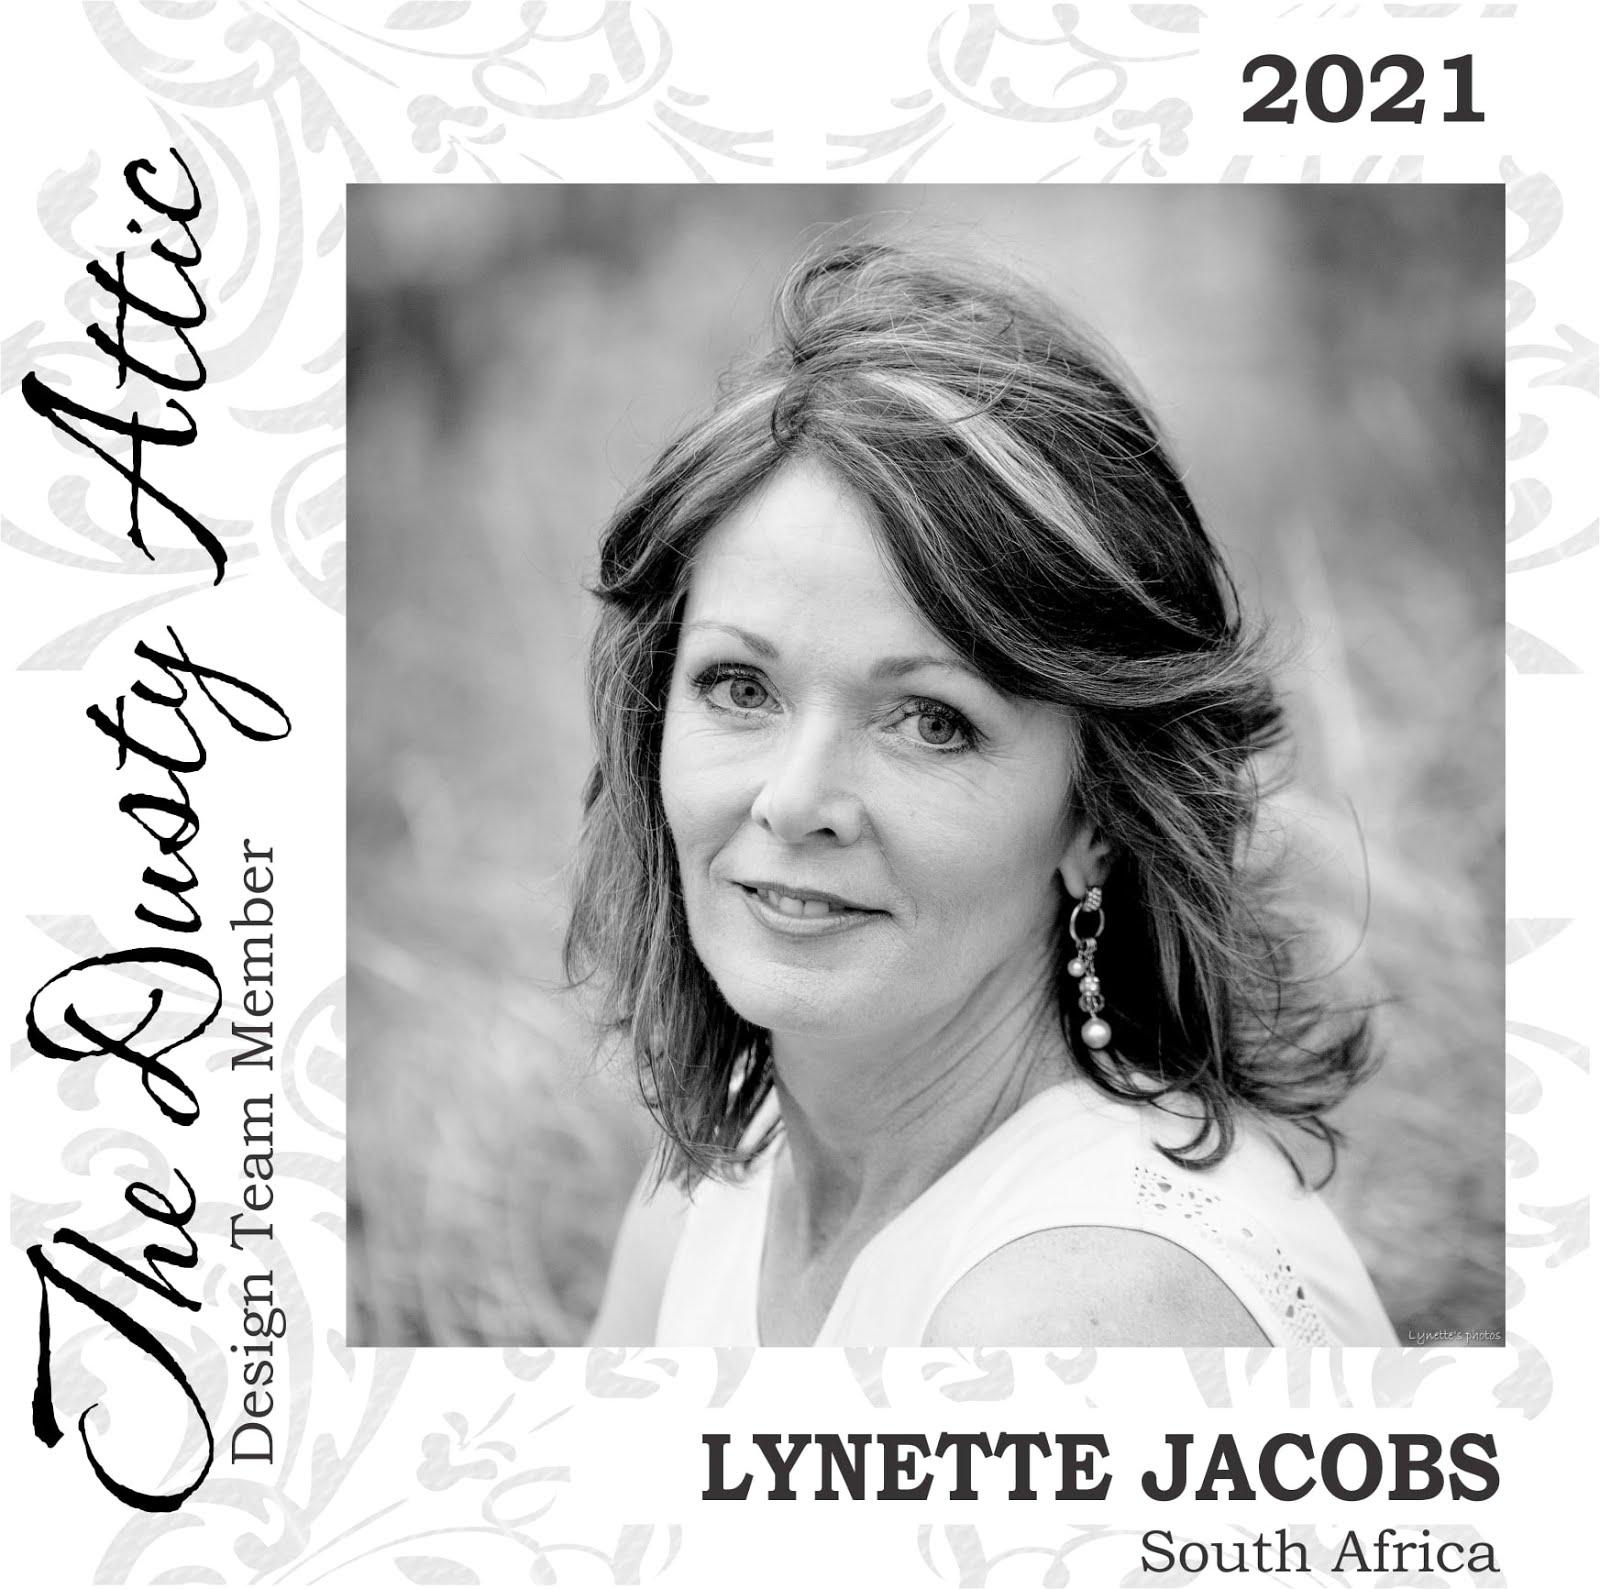 Lynette Jacobs